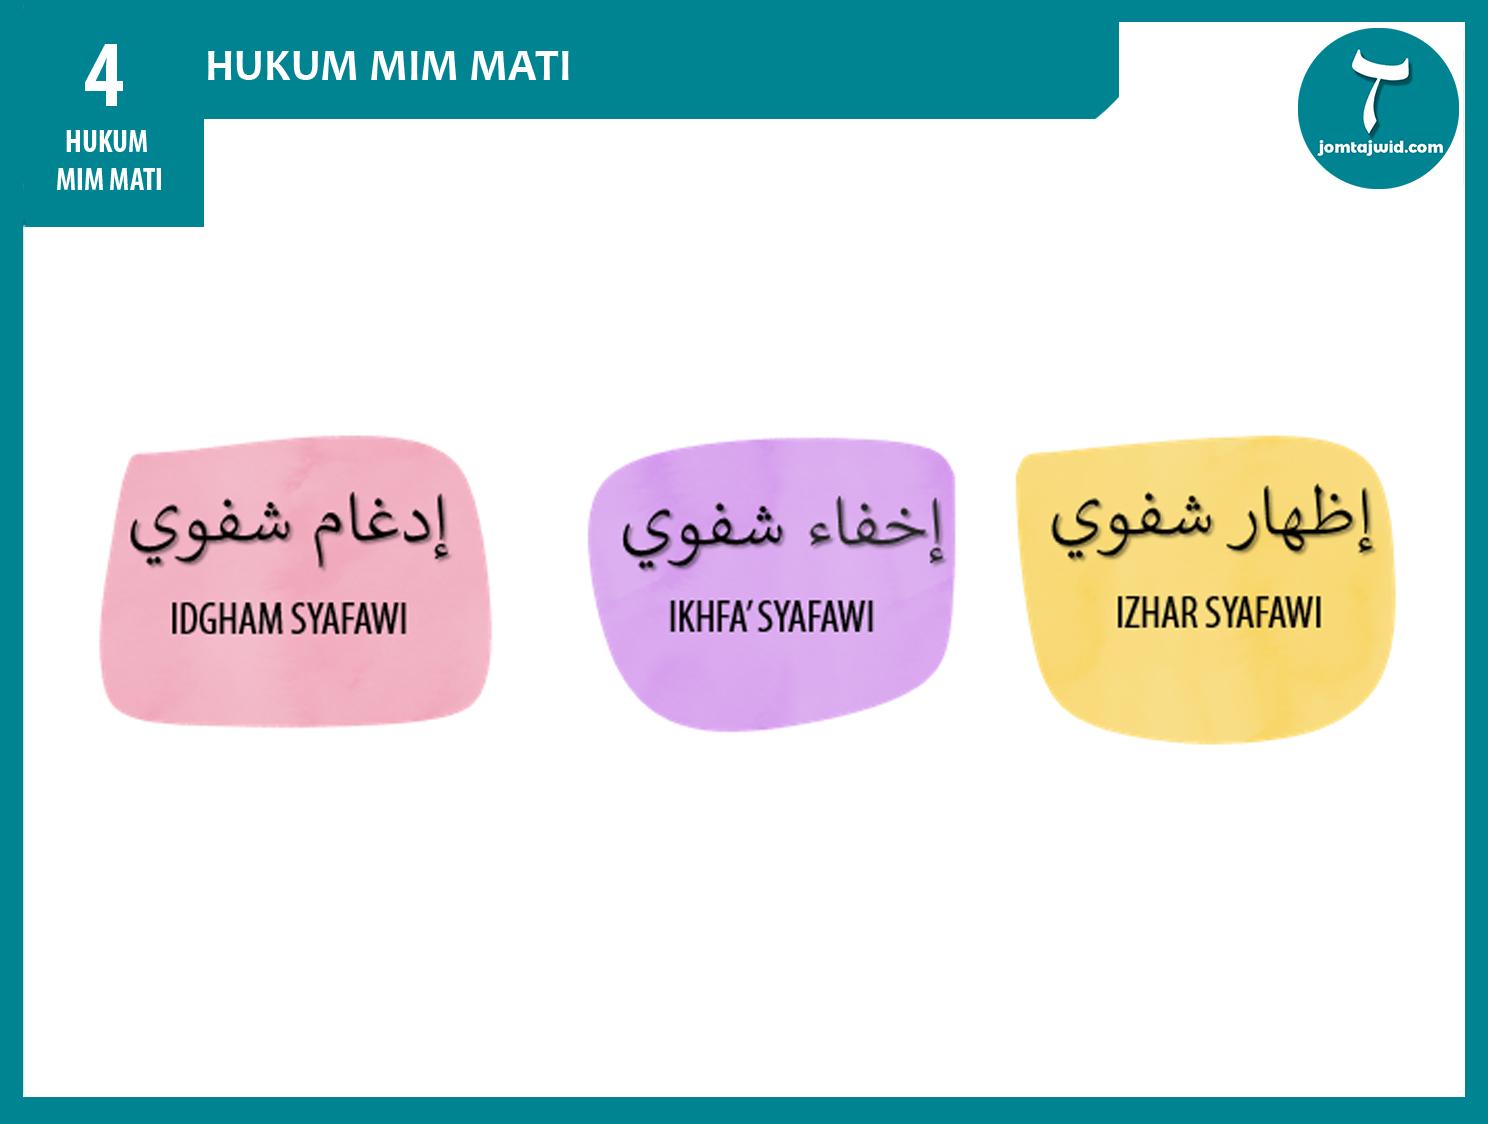 JomTajwid - Hukum Mim Mati 1 (Feature)